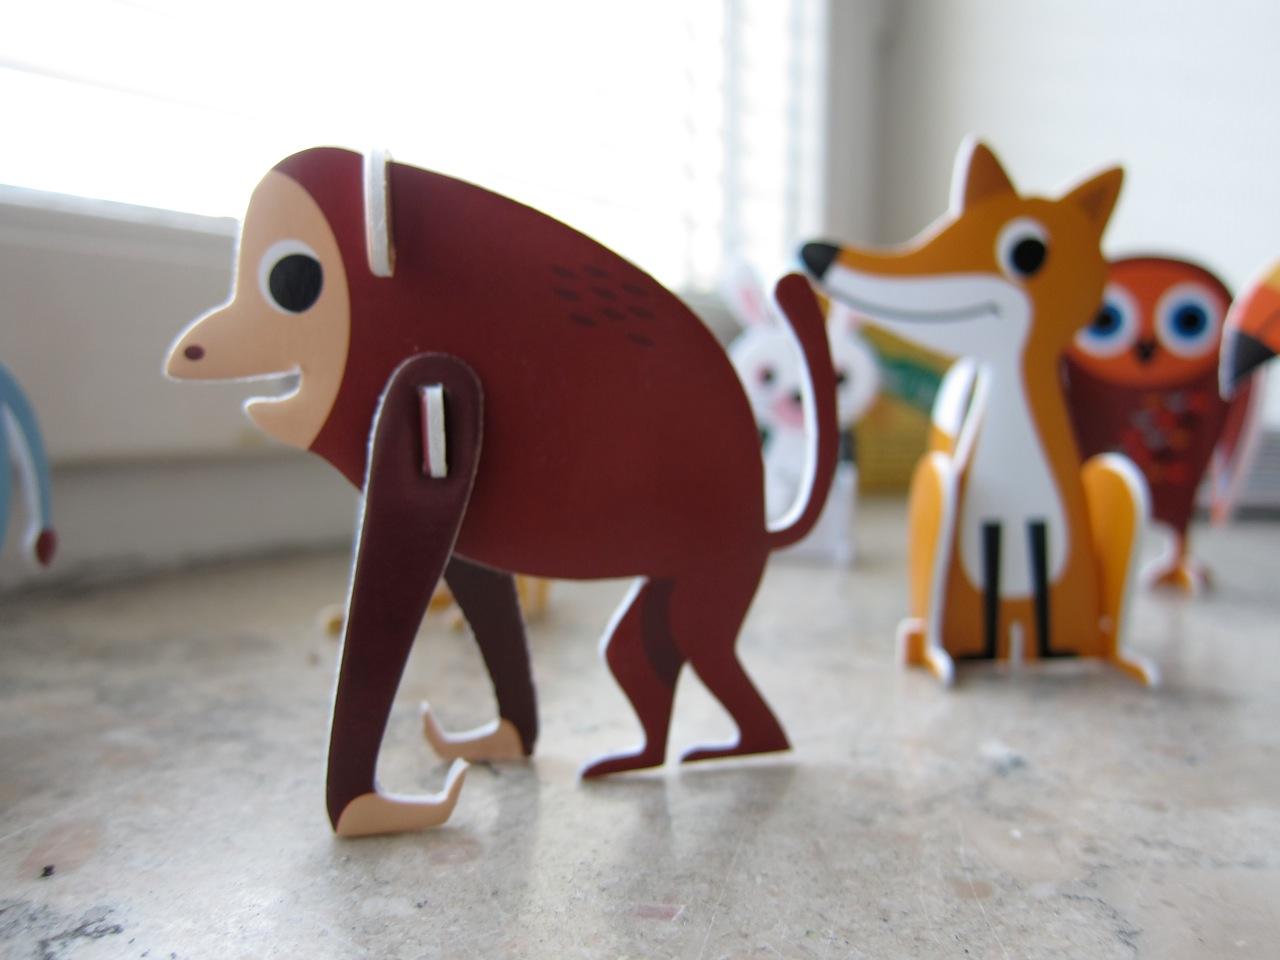 2D/3D Swedish animal puzzle